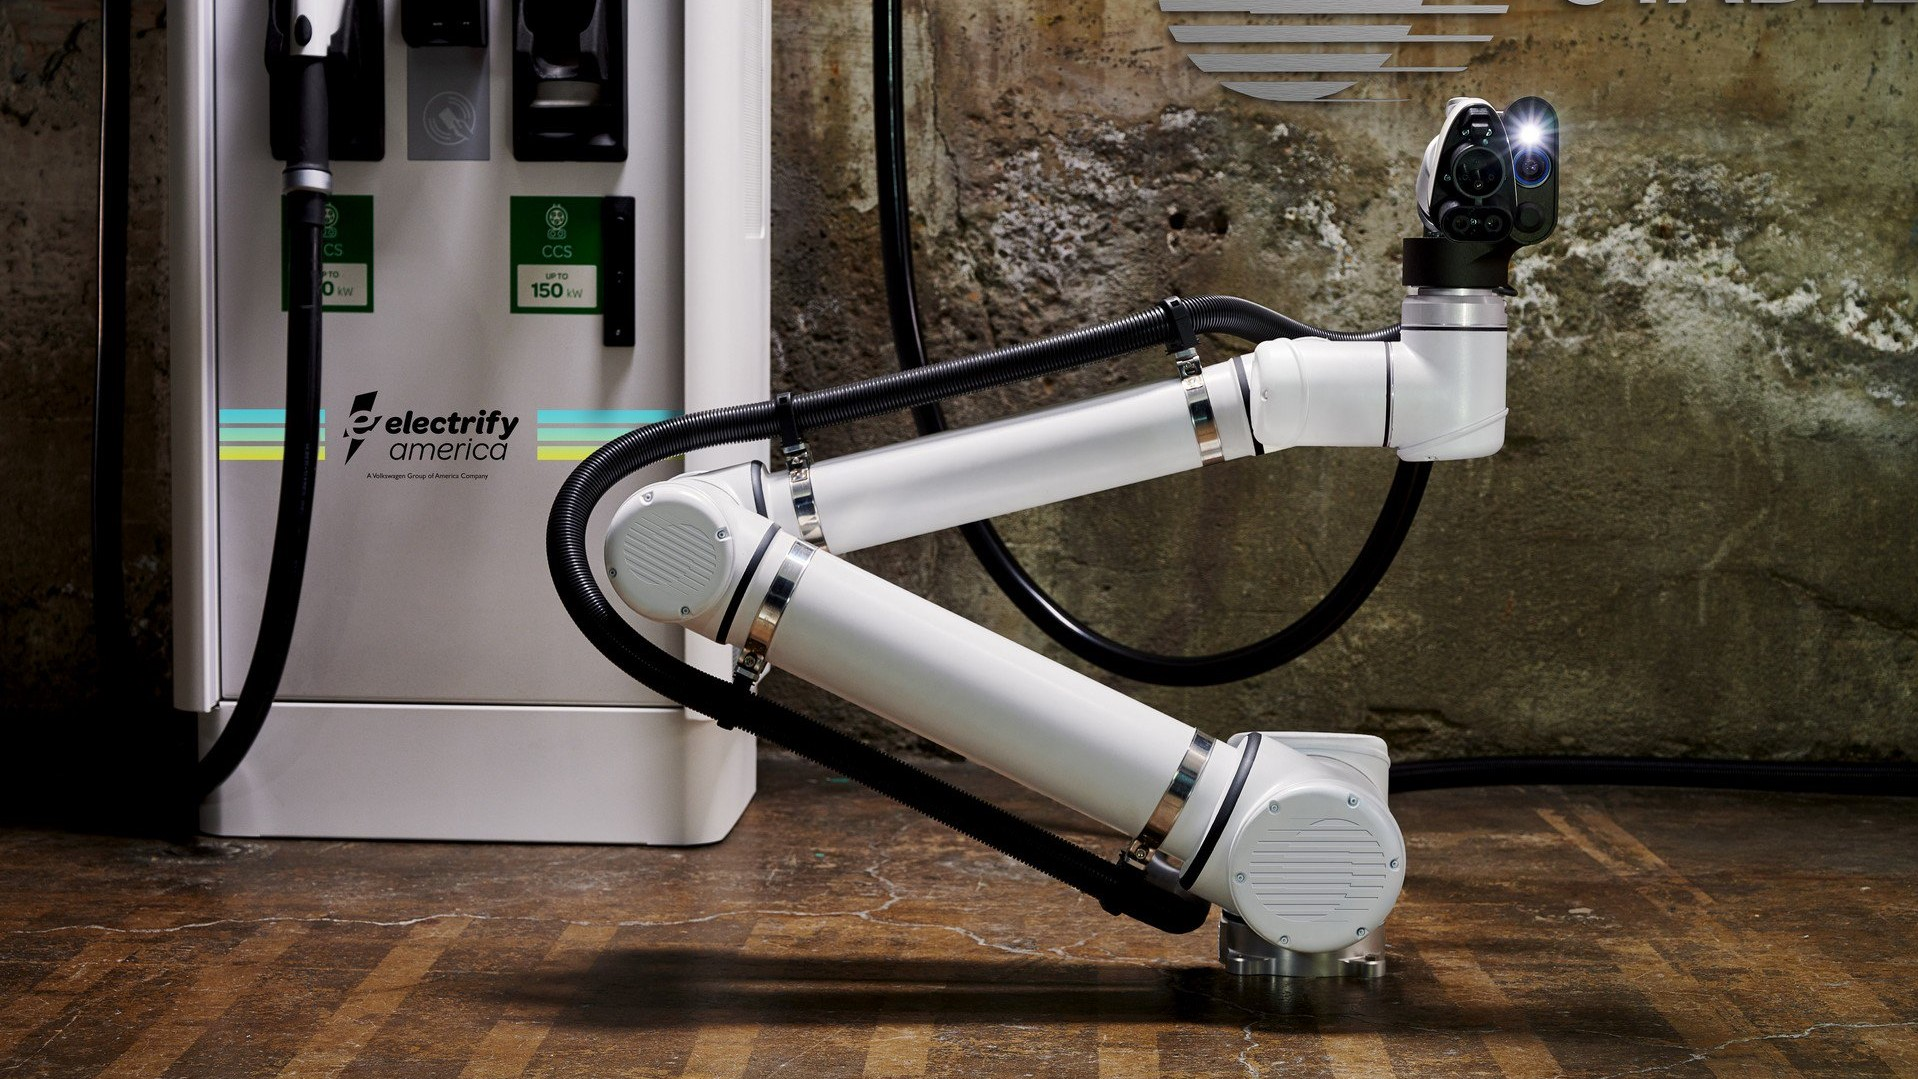 17df625d-electrify-america-robotic-ev-charger-1